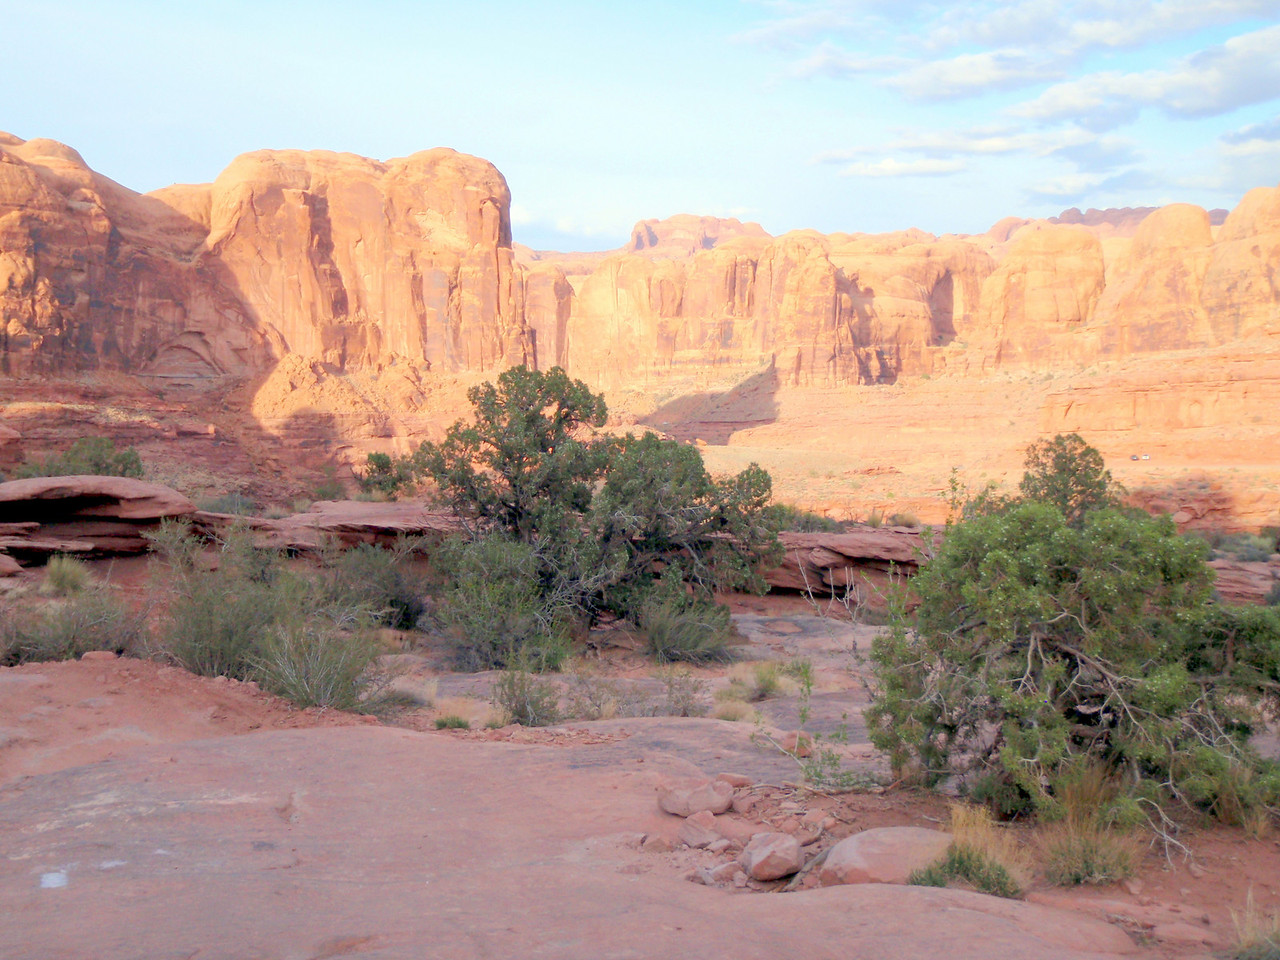 View from Amassa Back Near Moab, UT